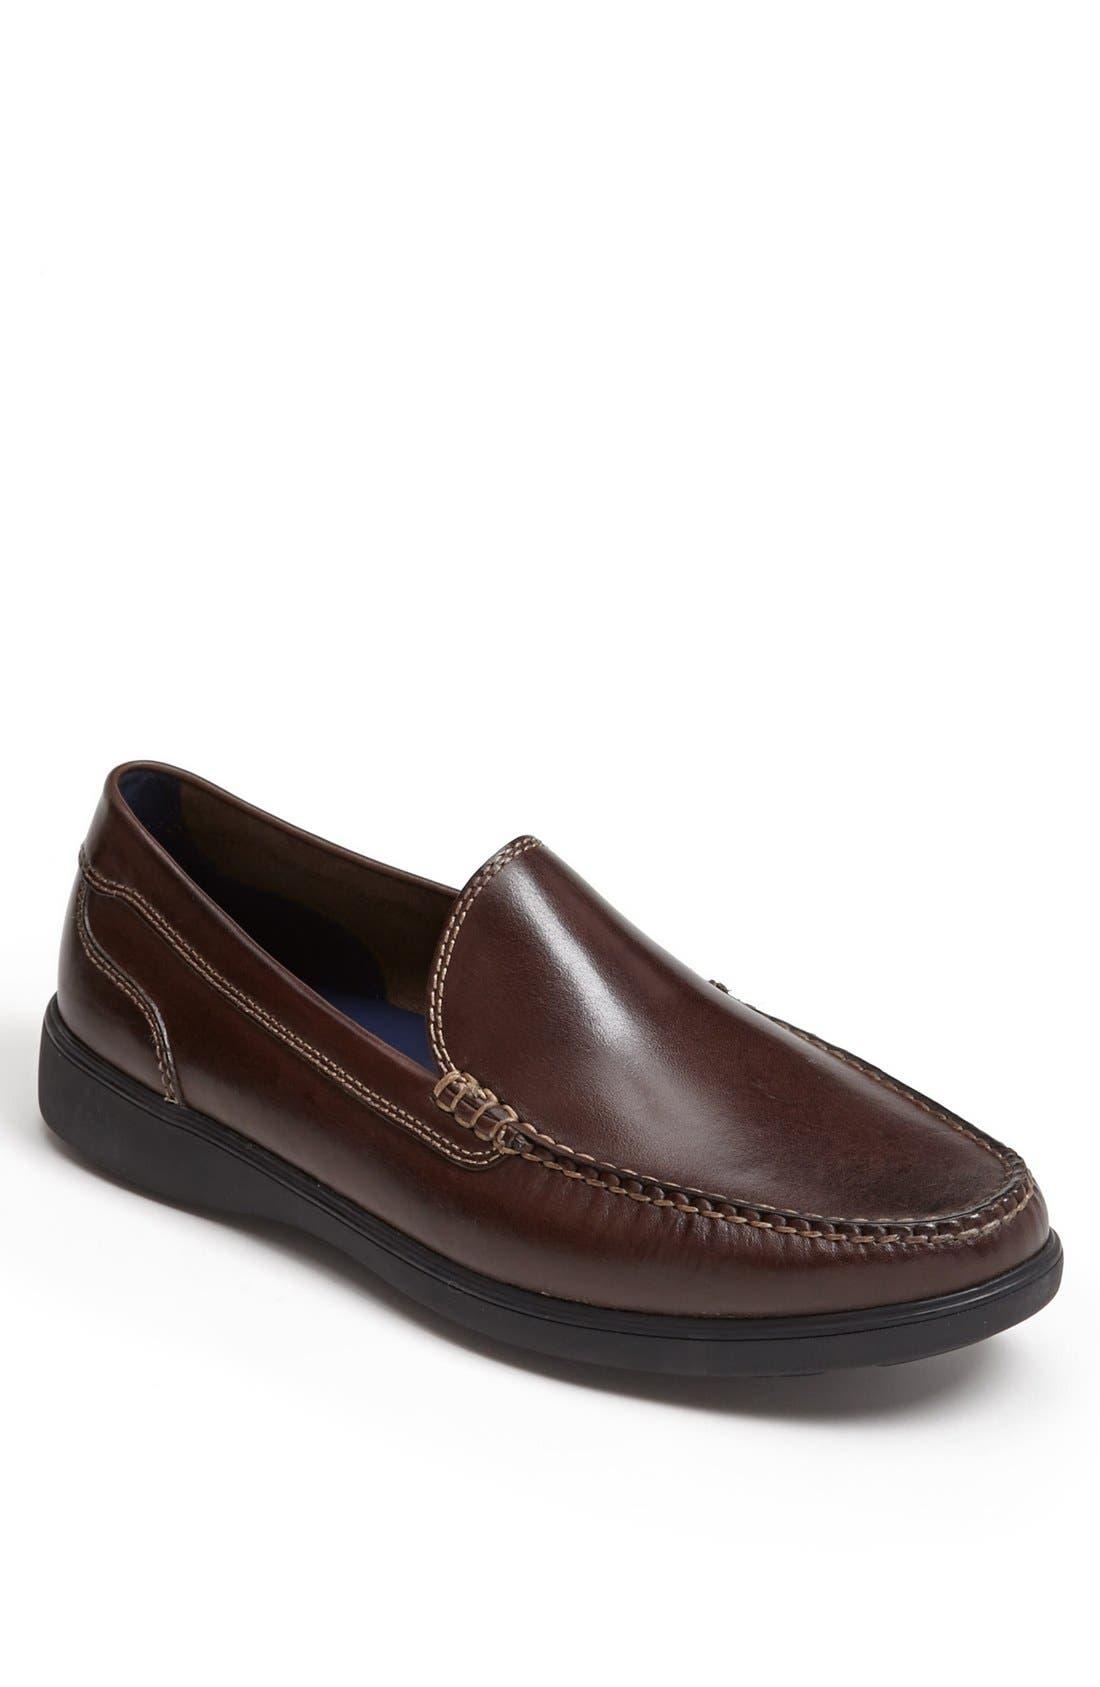 Main Image - Cole Haan 'Sutton' Venetian Loafer   (Men)